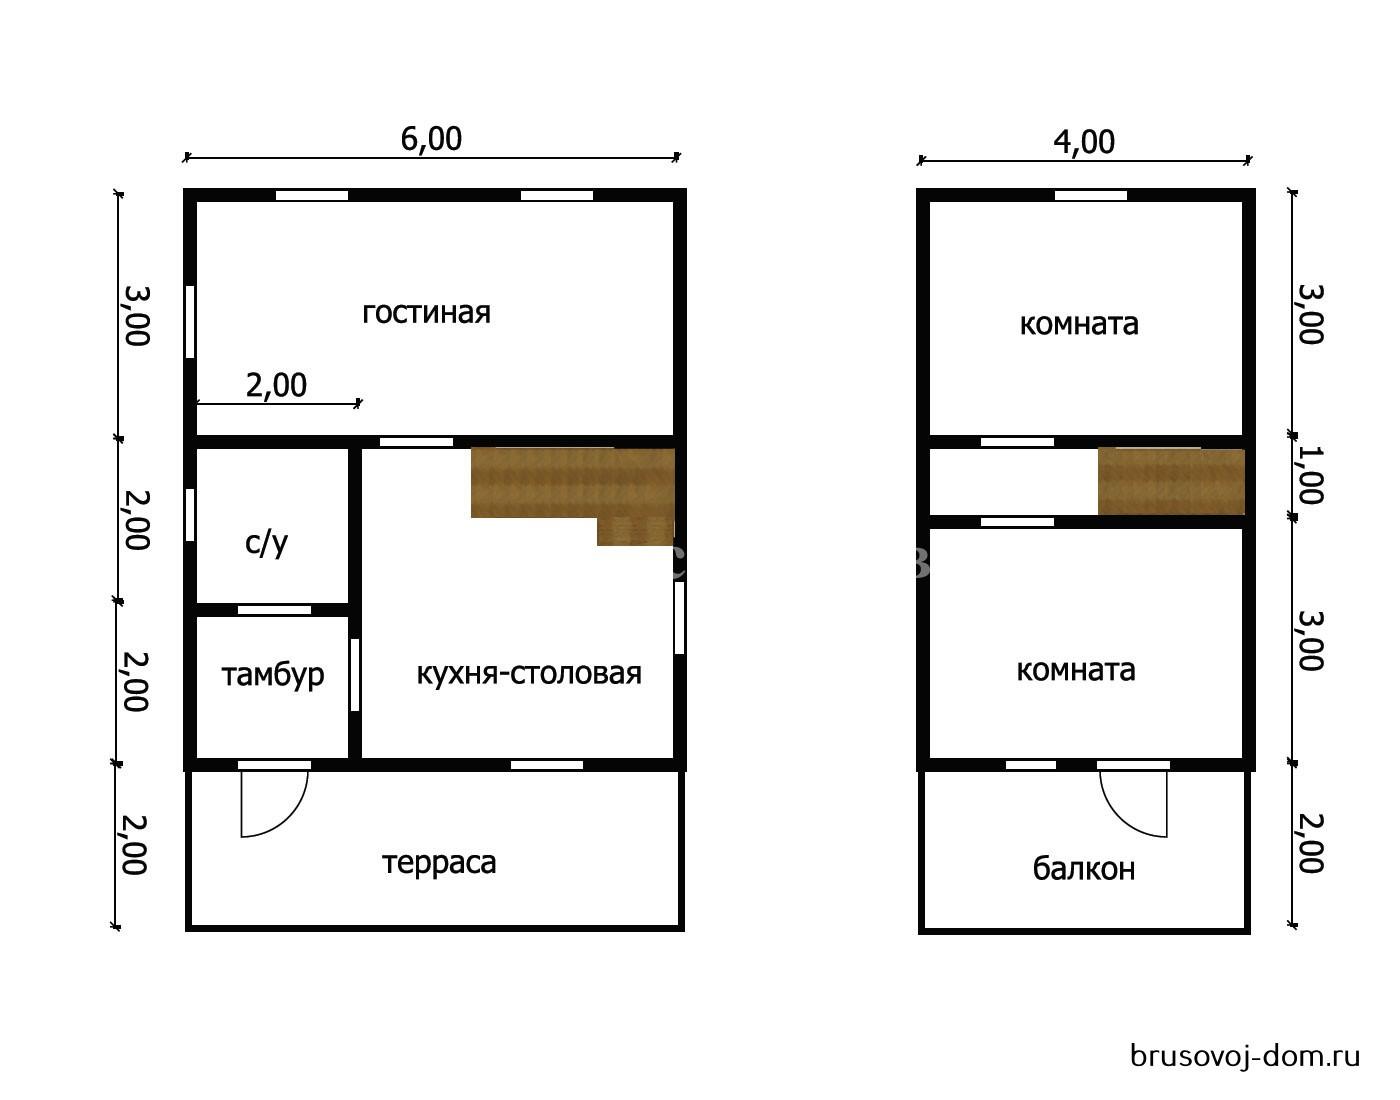 Дом под усадку 6х9 м Кингисеп